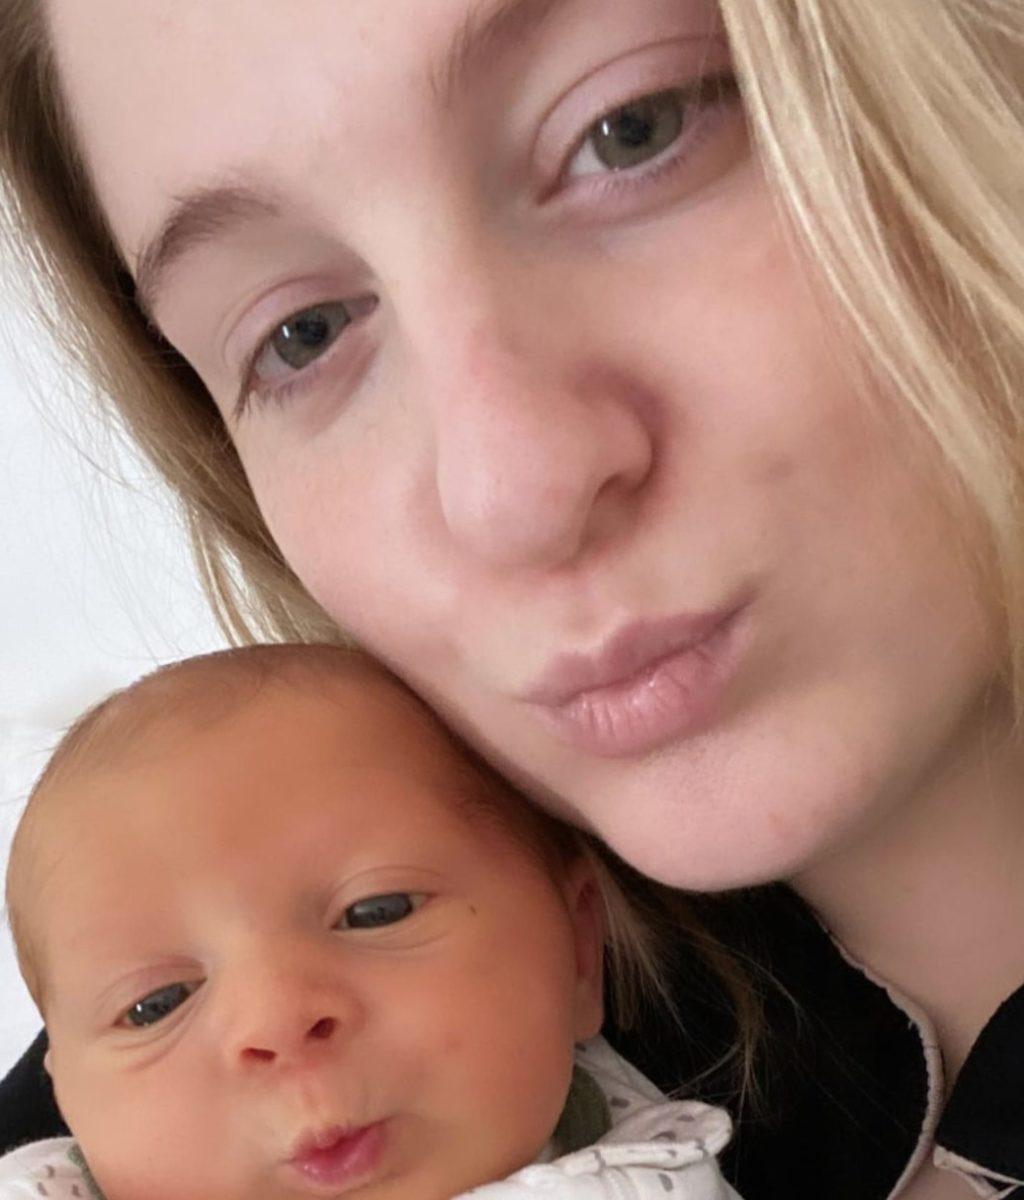 Meghan Trainor Has Her Baby Boy With Daryl Sabara